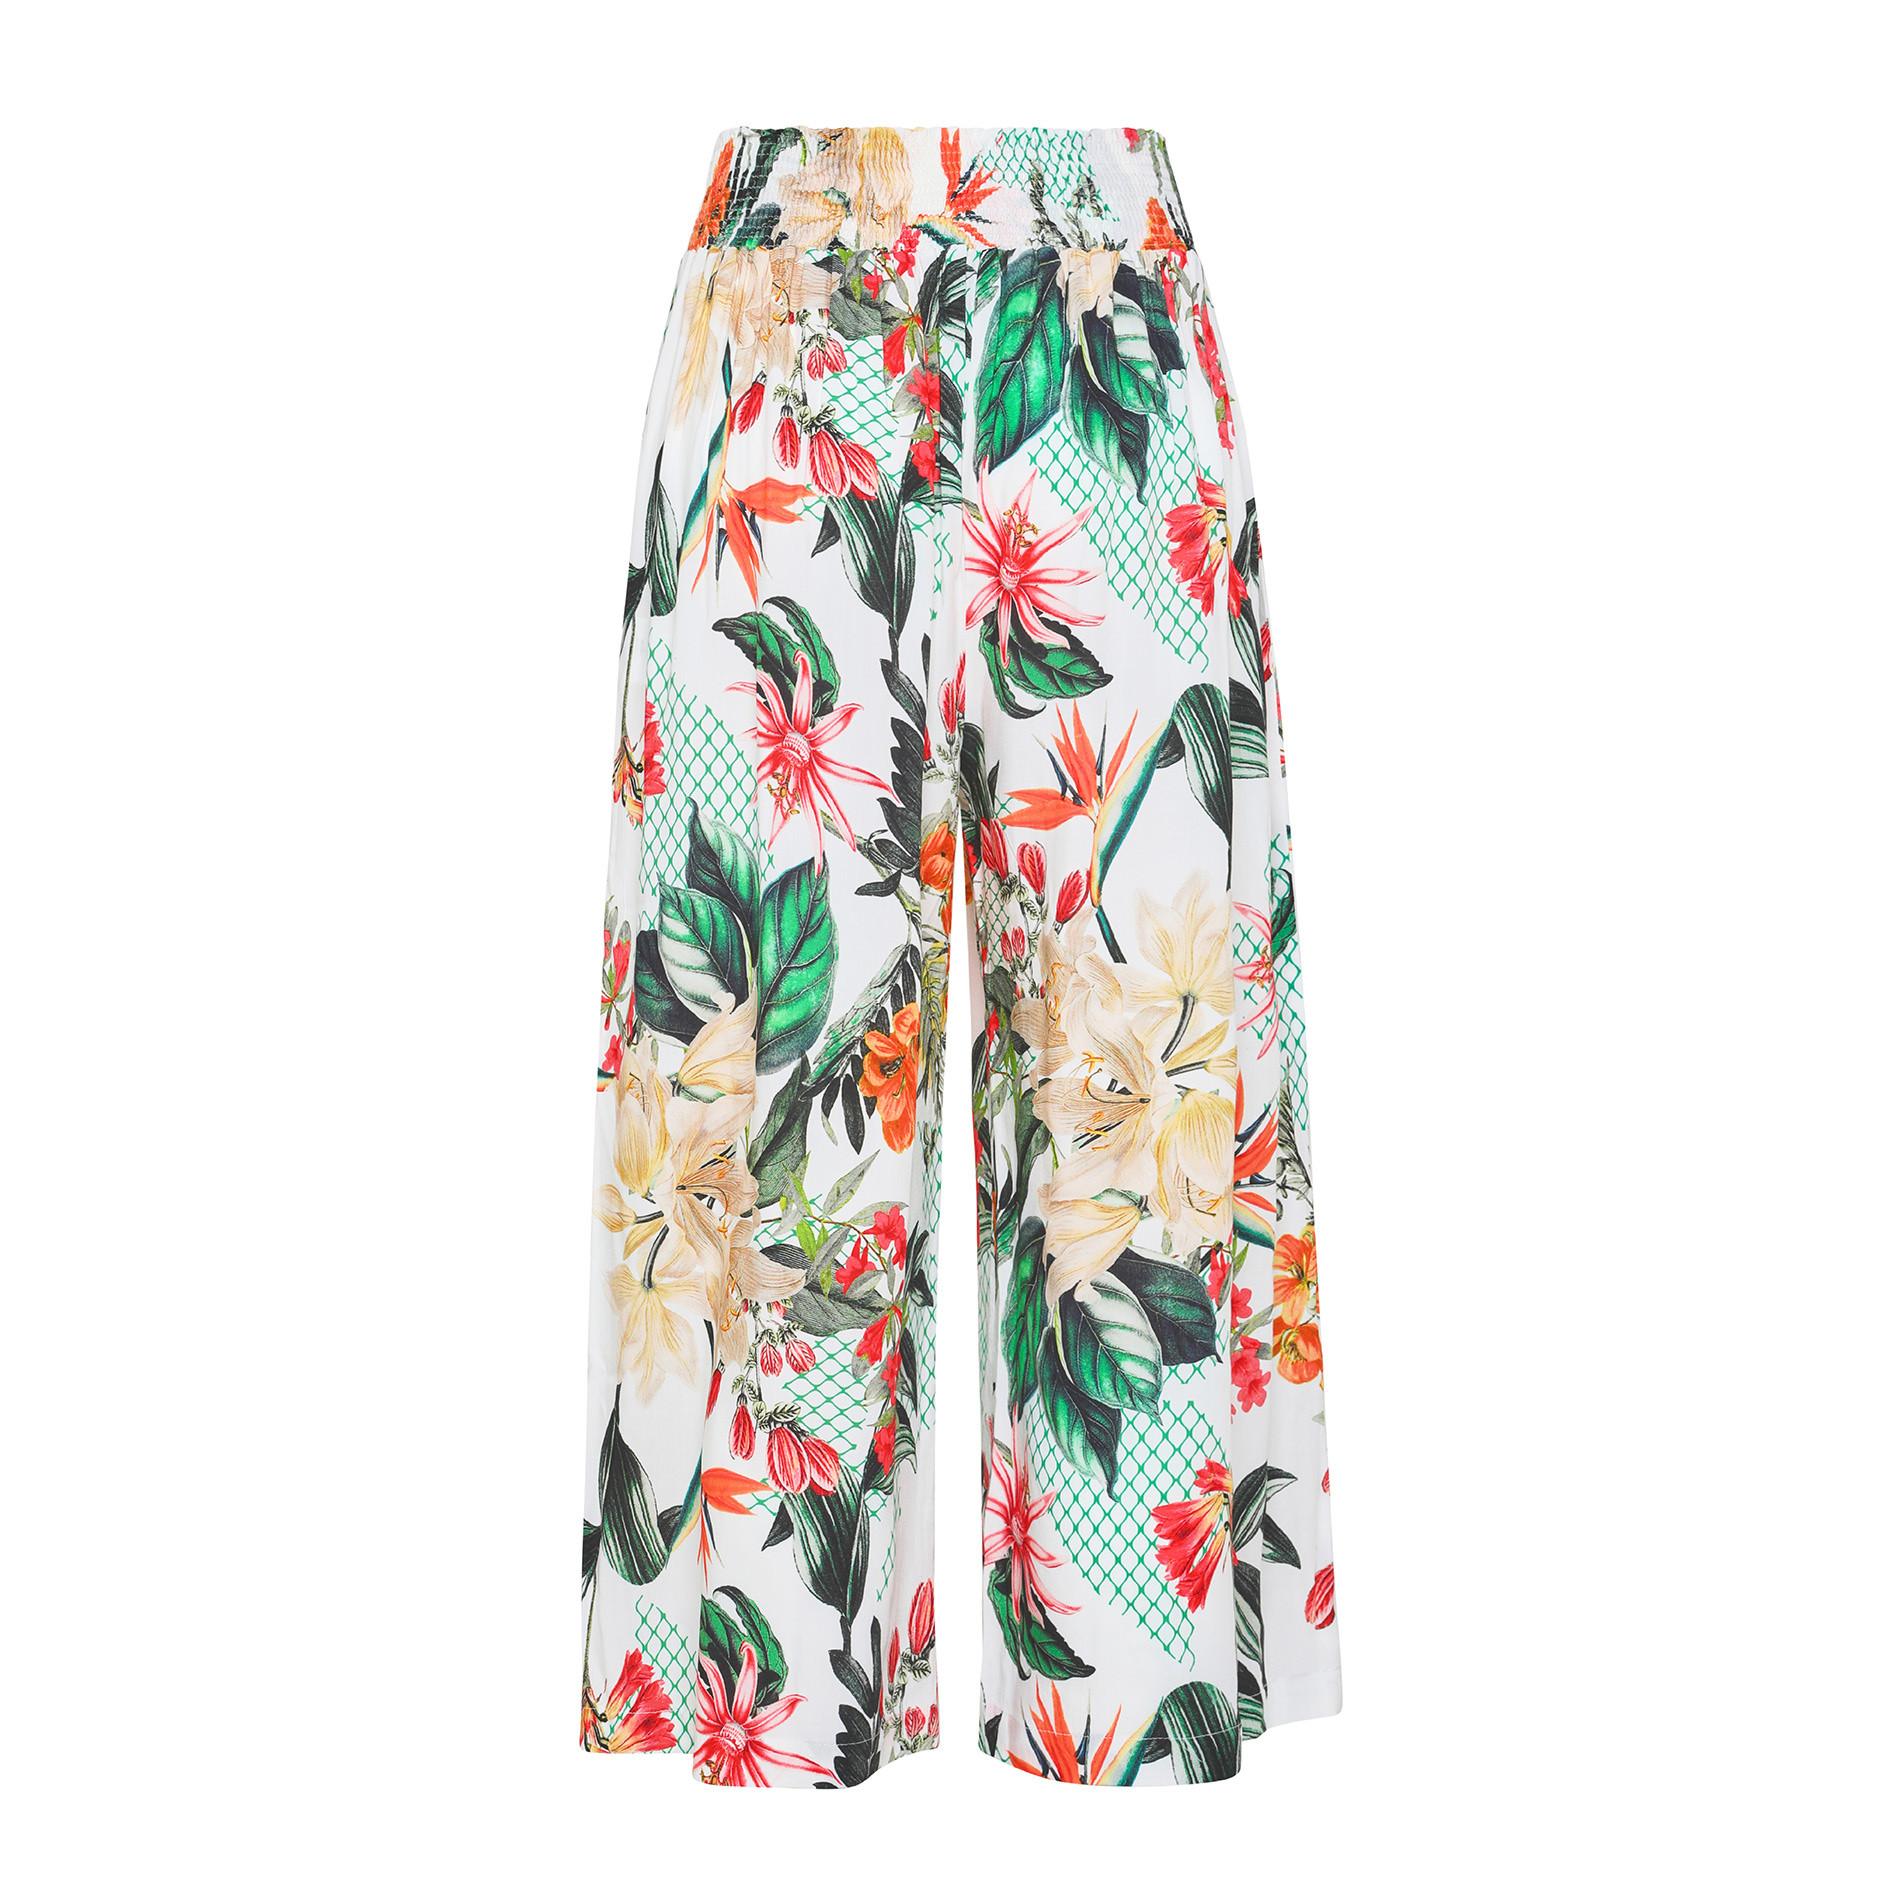 Pantalone ampio in viscosa stampa floreale, Multicolor, large image number 0